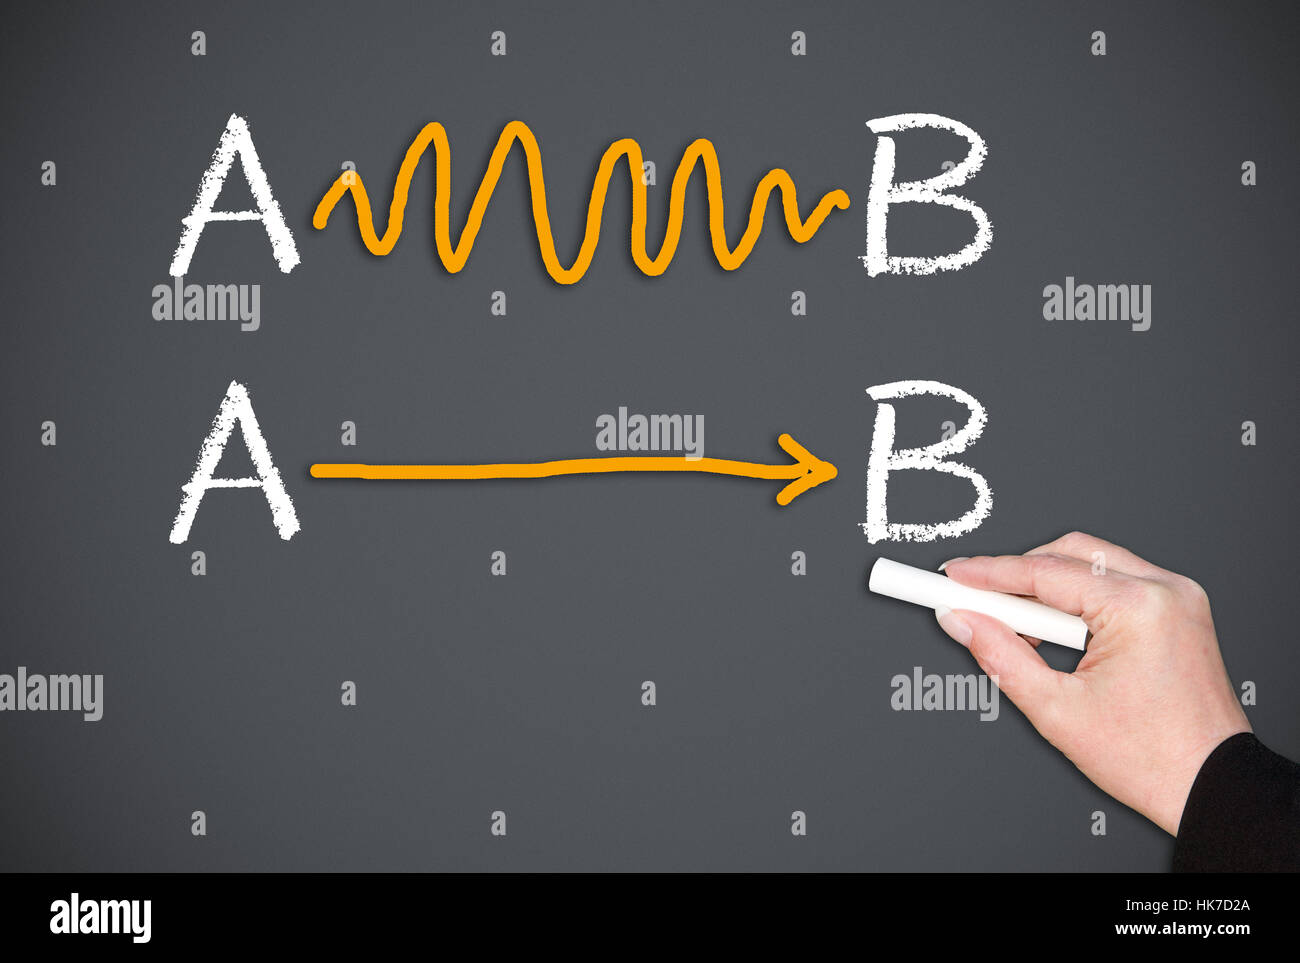 strategy, model, design, project, concept, plan, draft, transport, logistics, - Stock Image